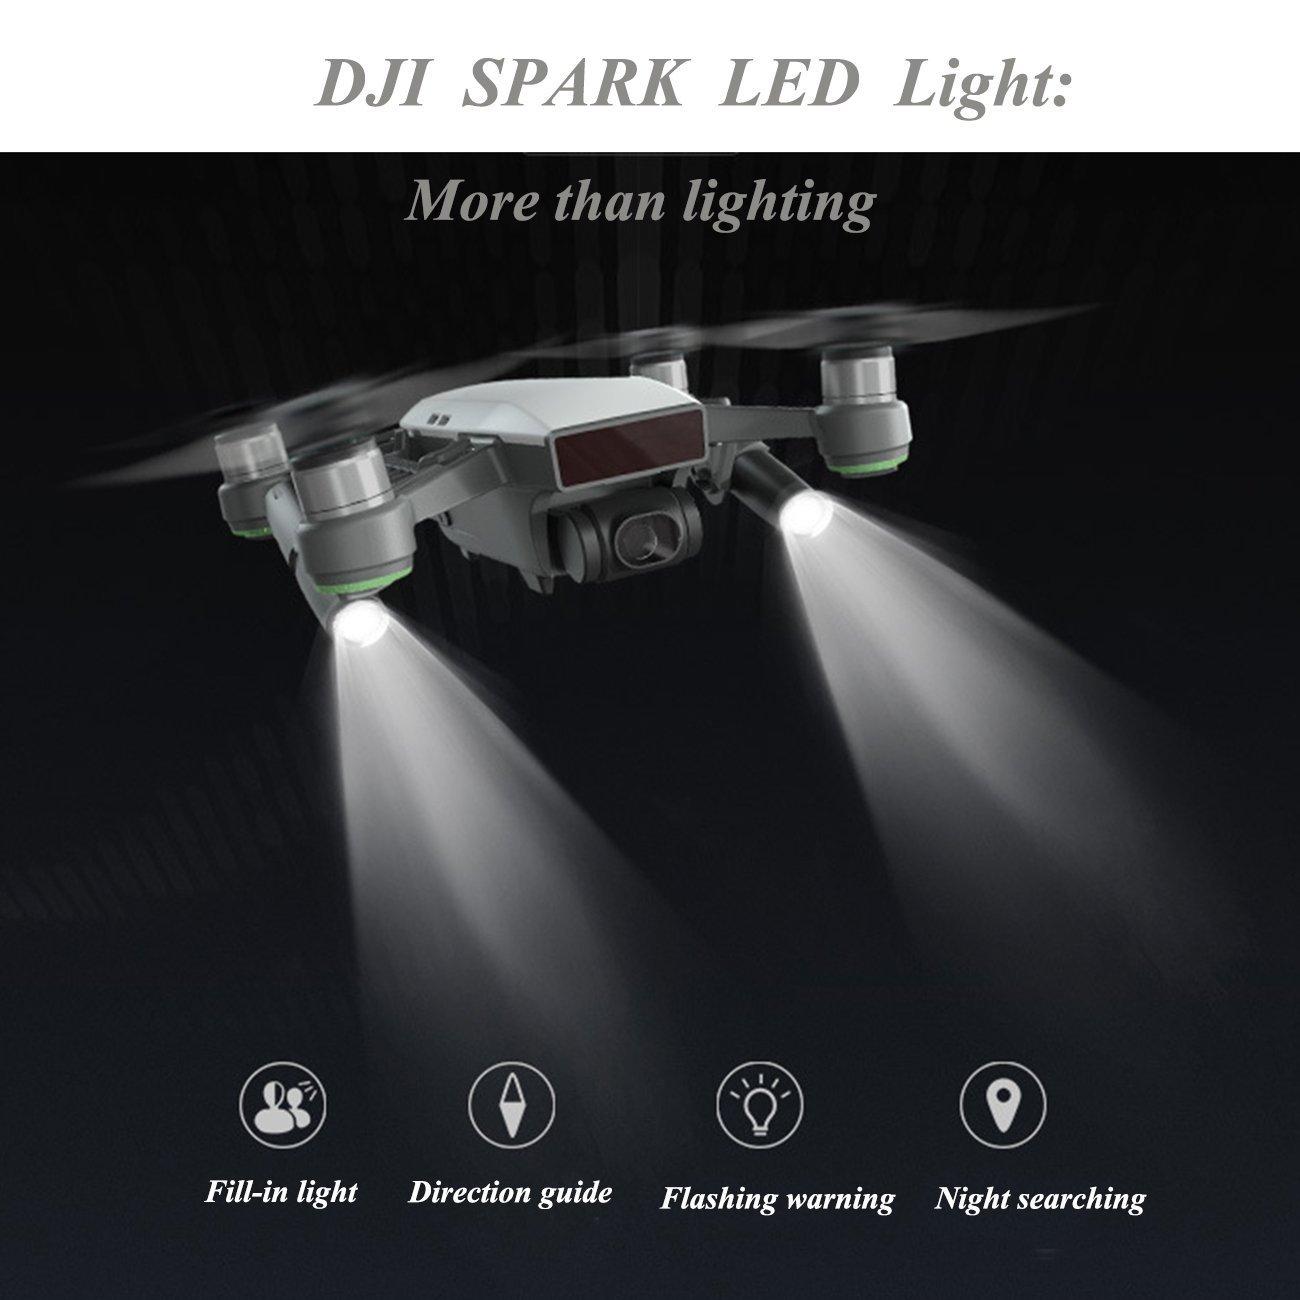 Dji Mavic Air Accessories Led Light Kit Small Flashlight Long Range Adjustable Strobe Luminosity For